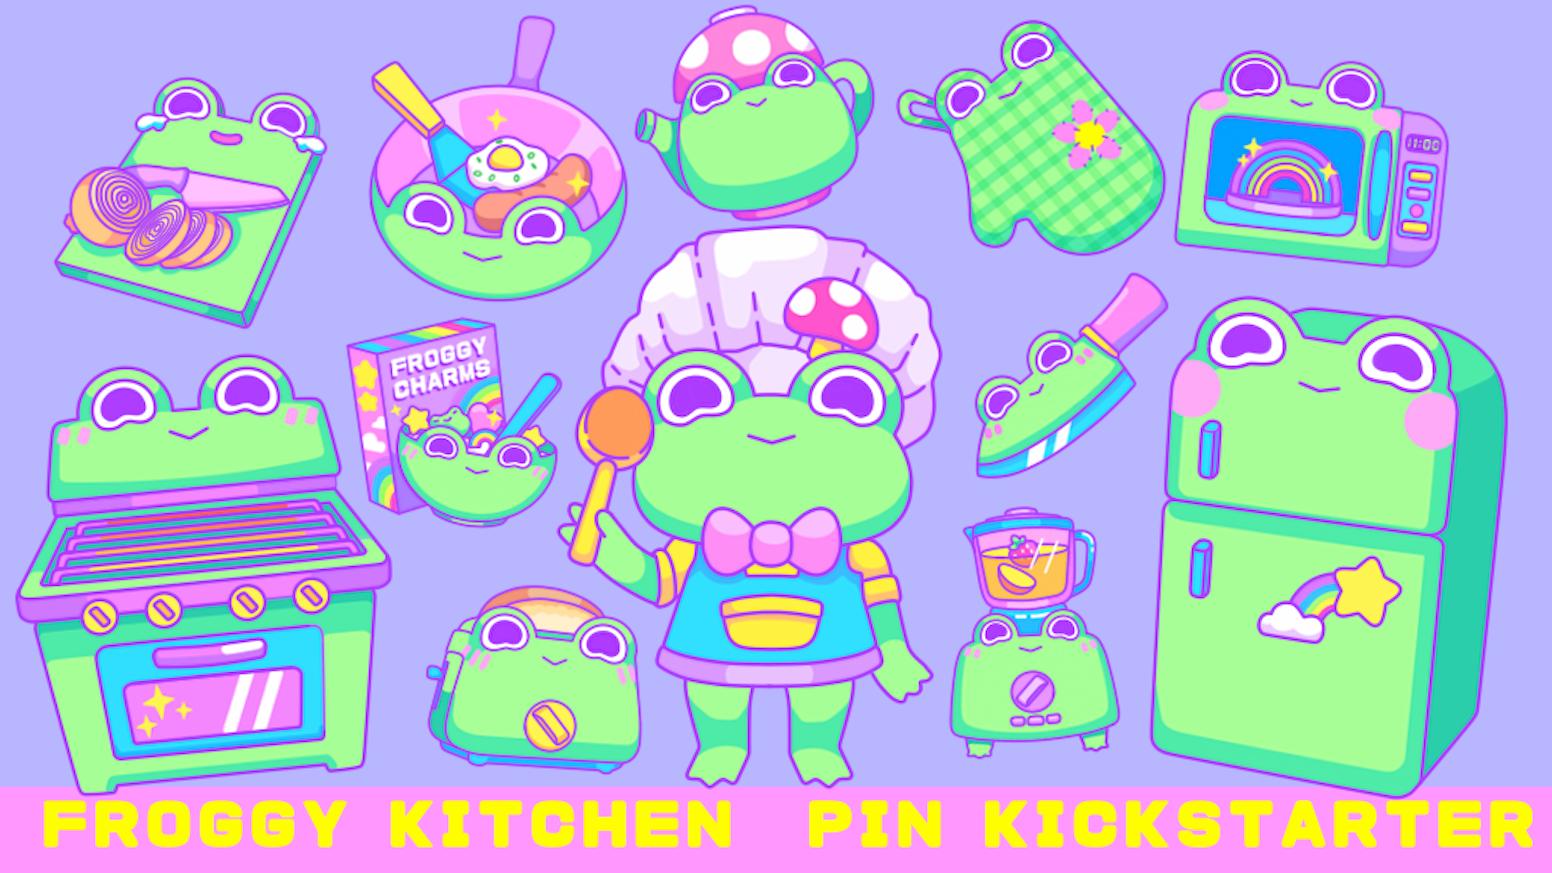 Froggy Kitchen Acrylic Pins by Kirakirakarakasa — Kickstarter